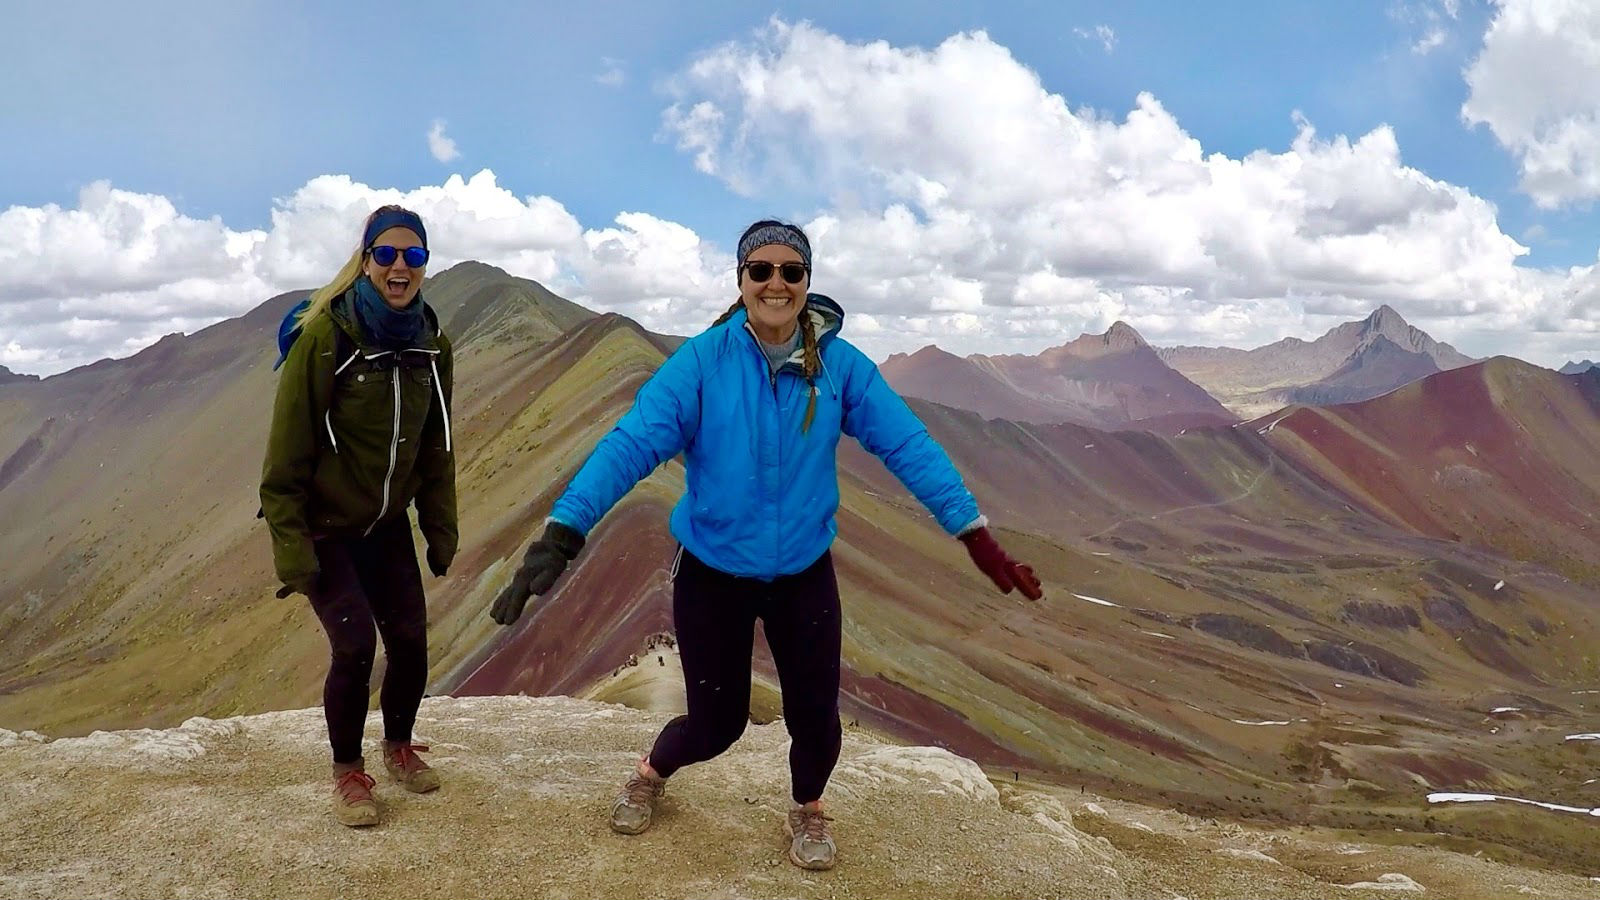 traveler-review-traveling-to-peru-rainbow-mountain.jpg